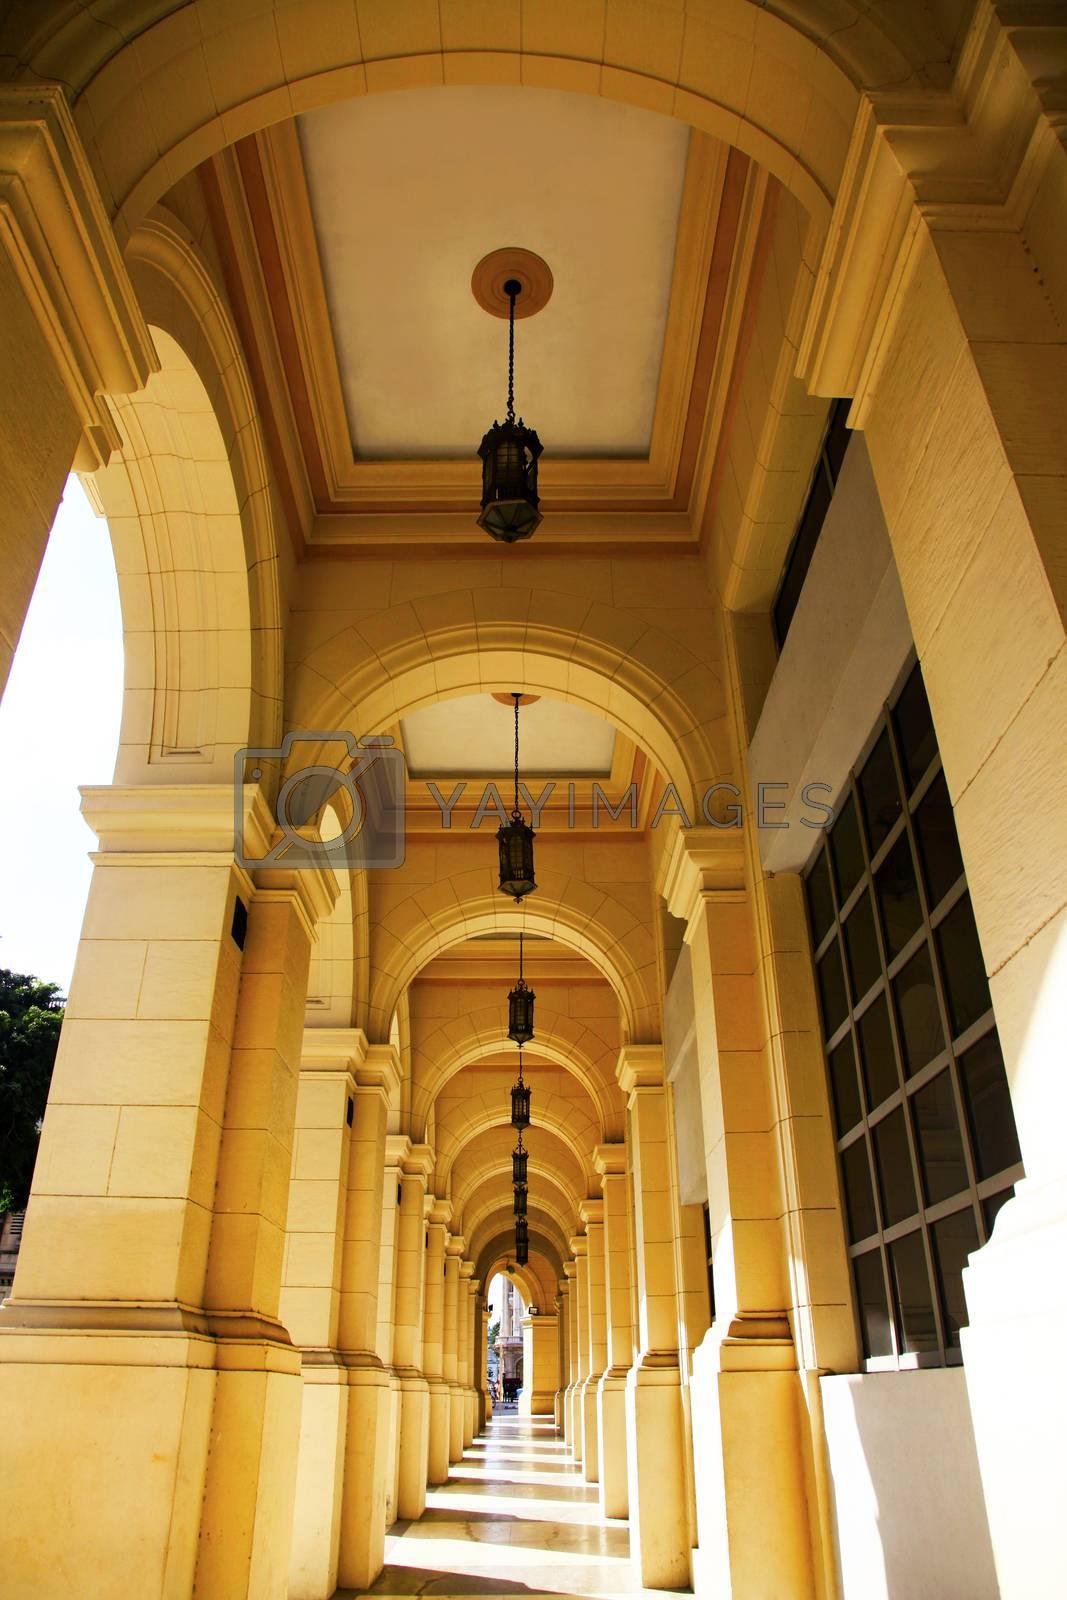 Typical portico under a colonial building in Cuba